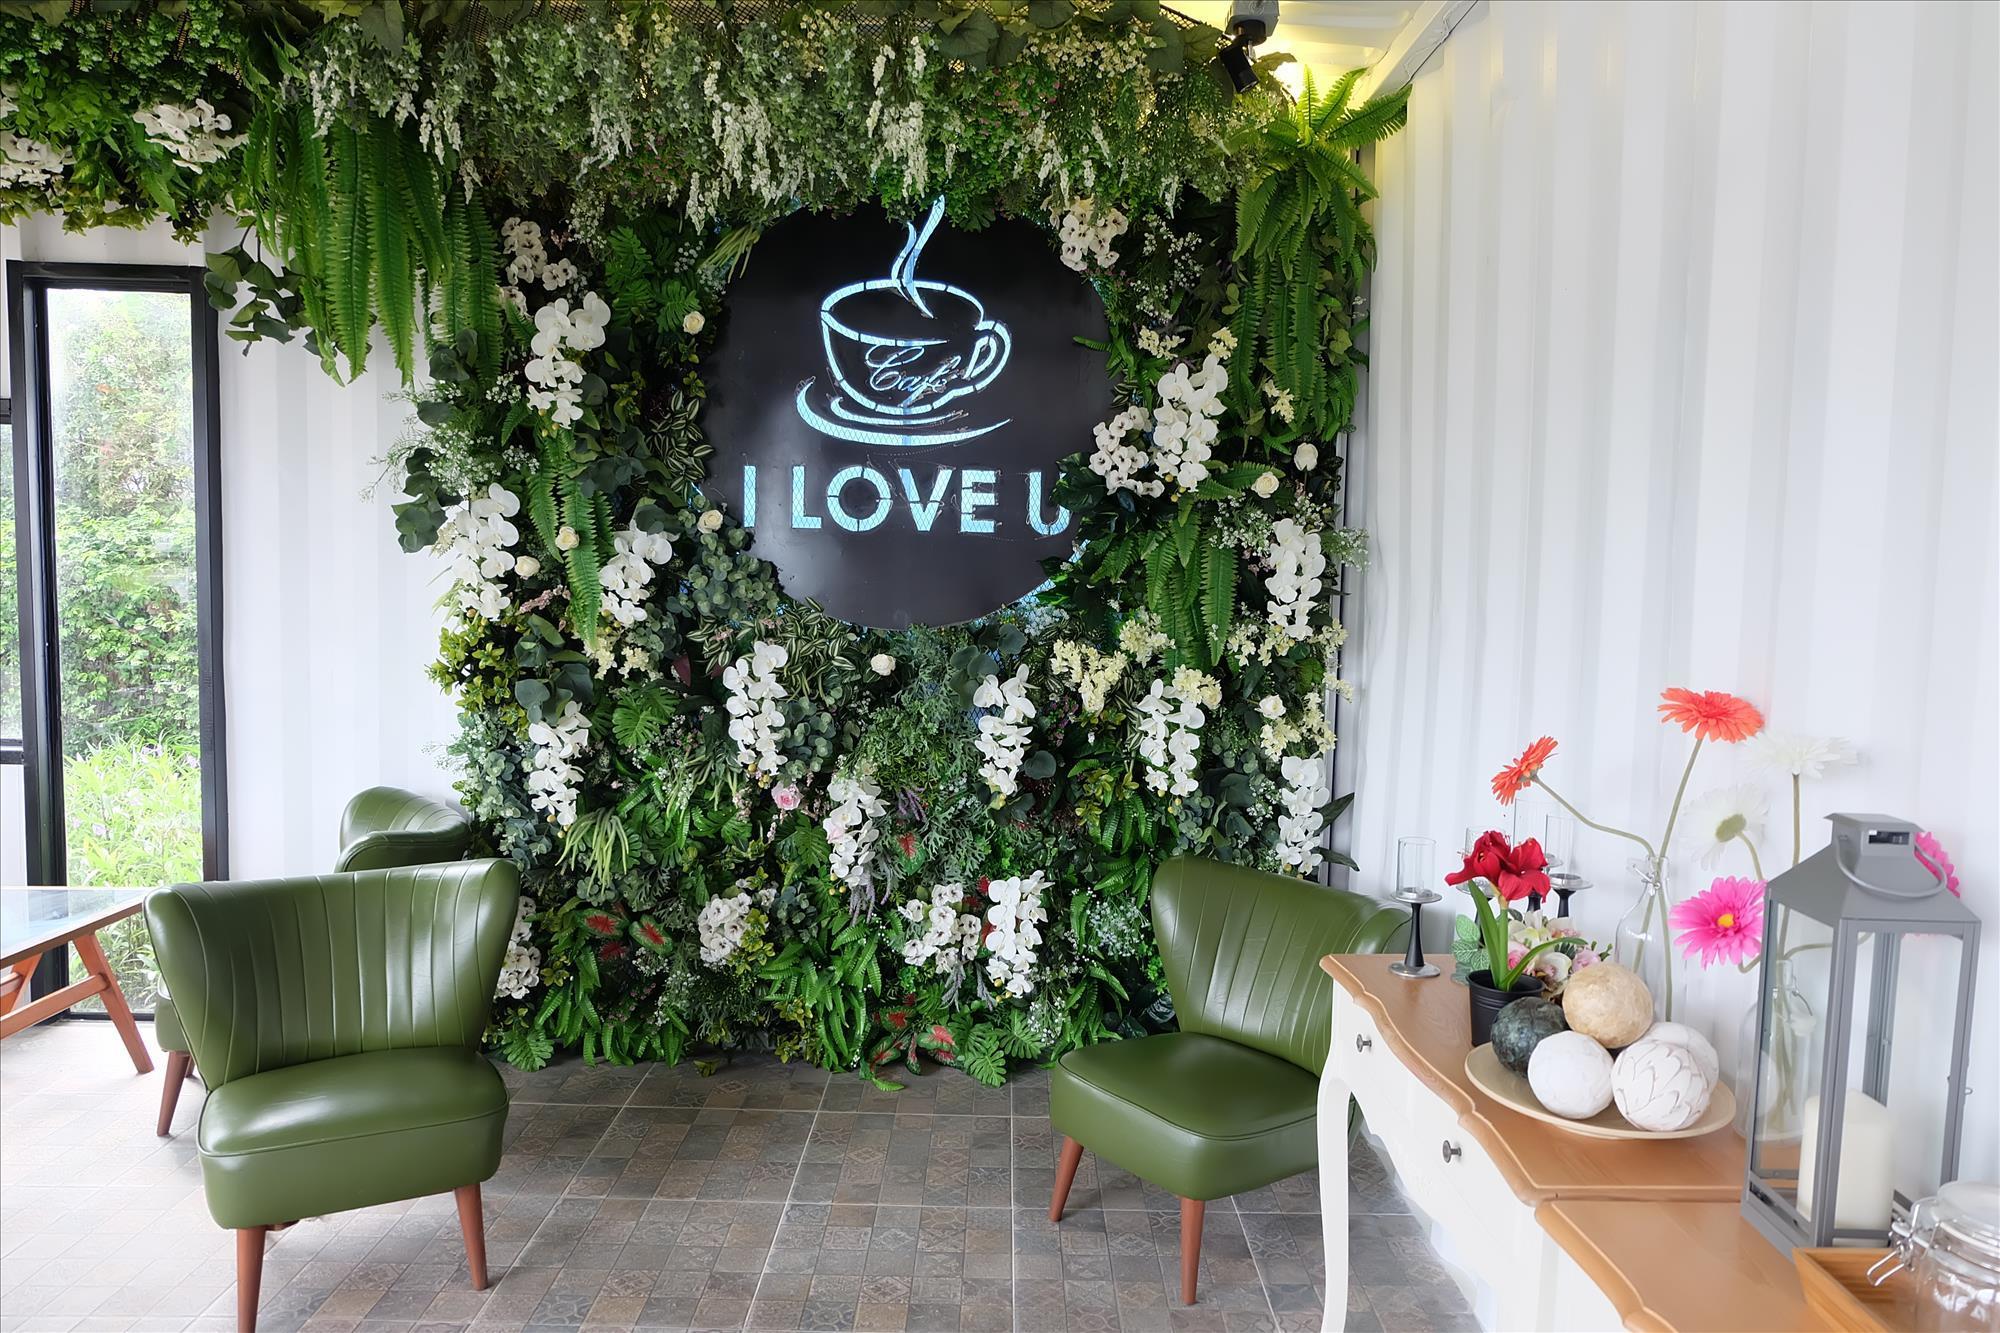 Cafe I Love U